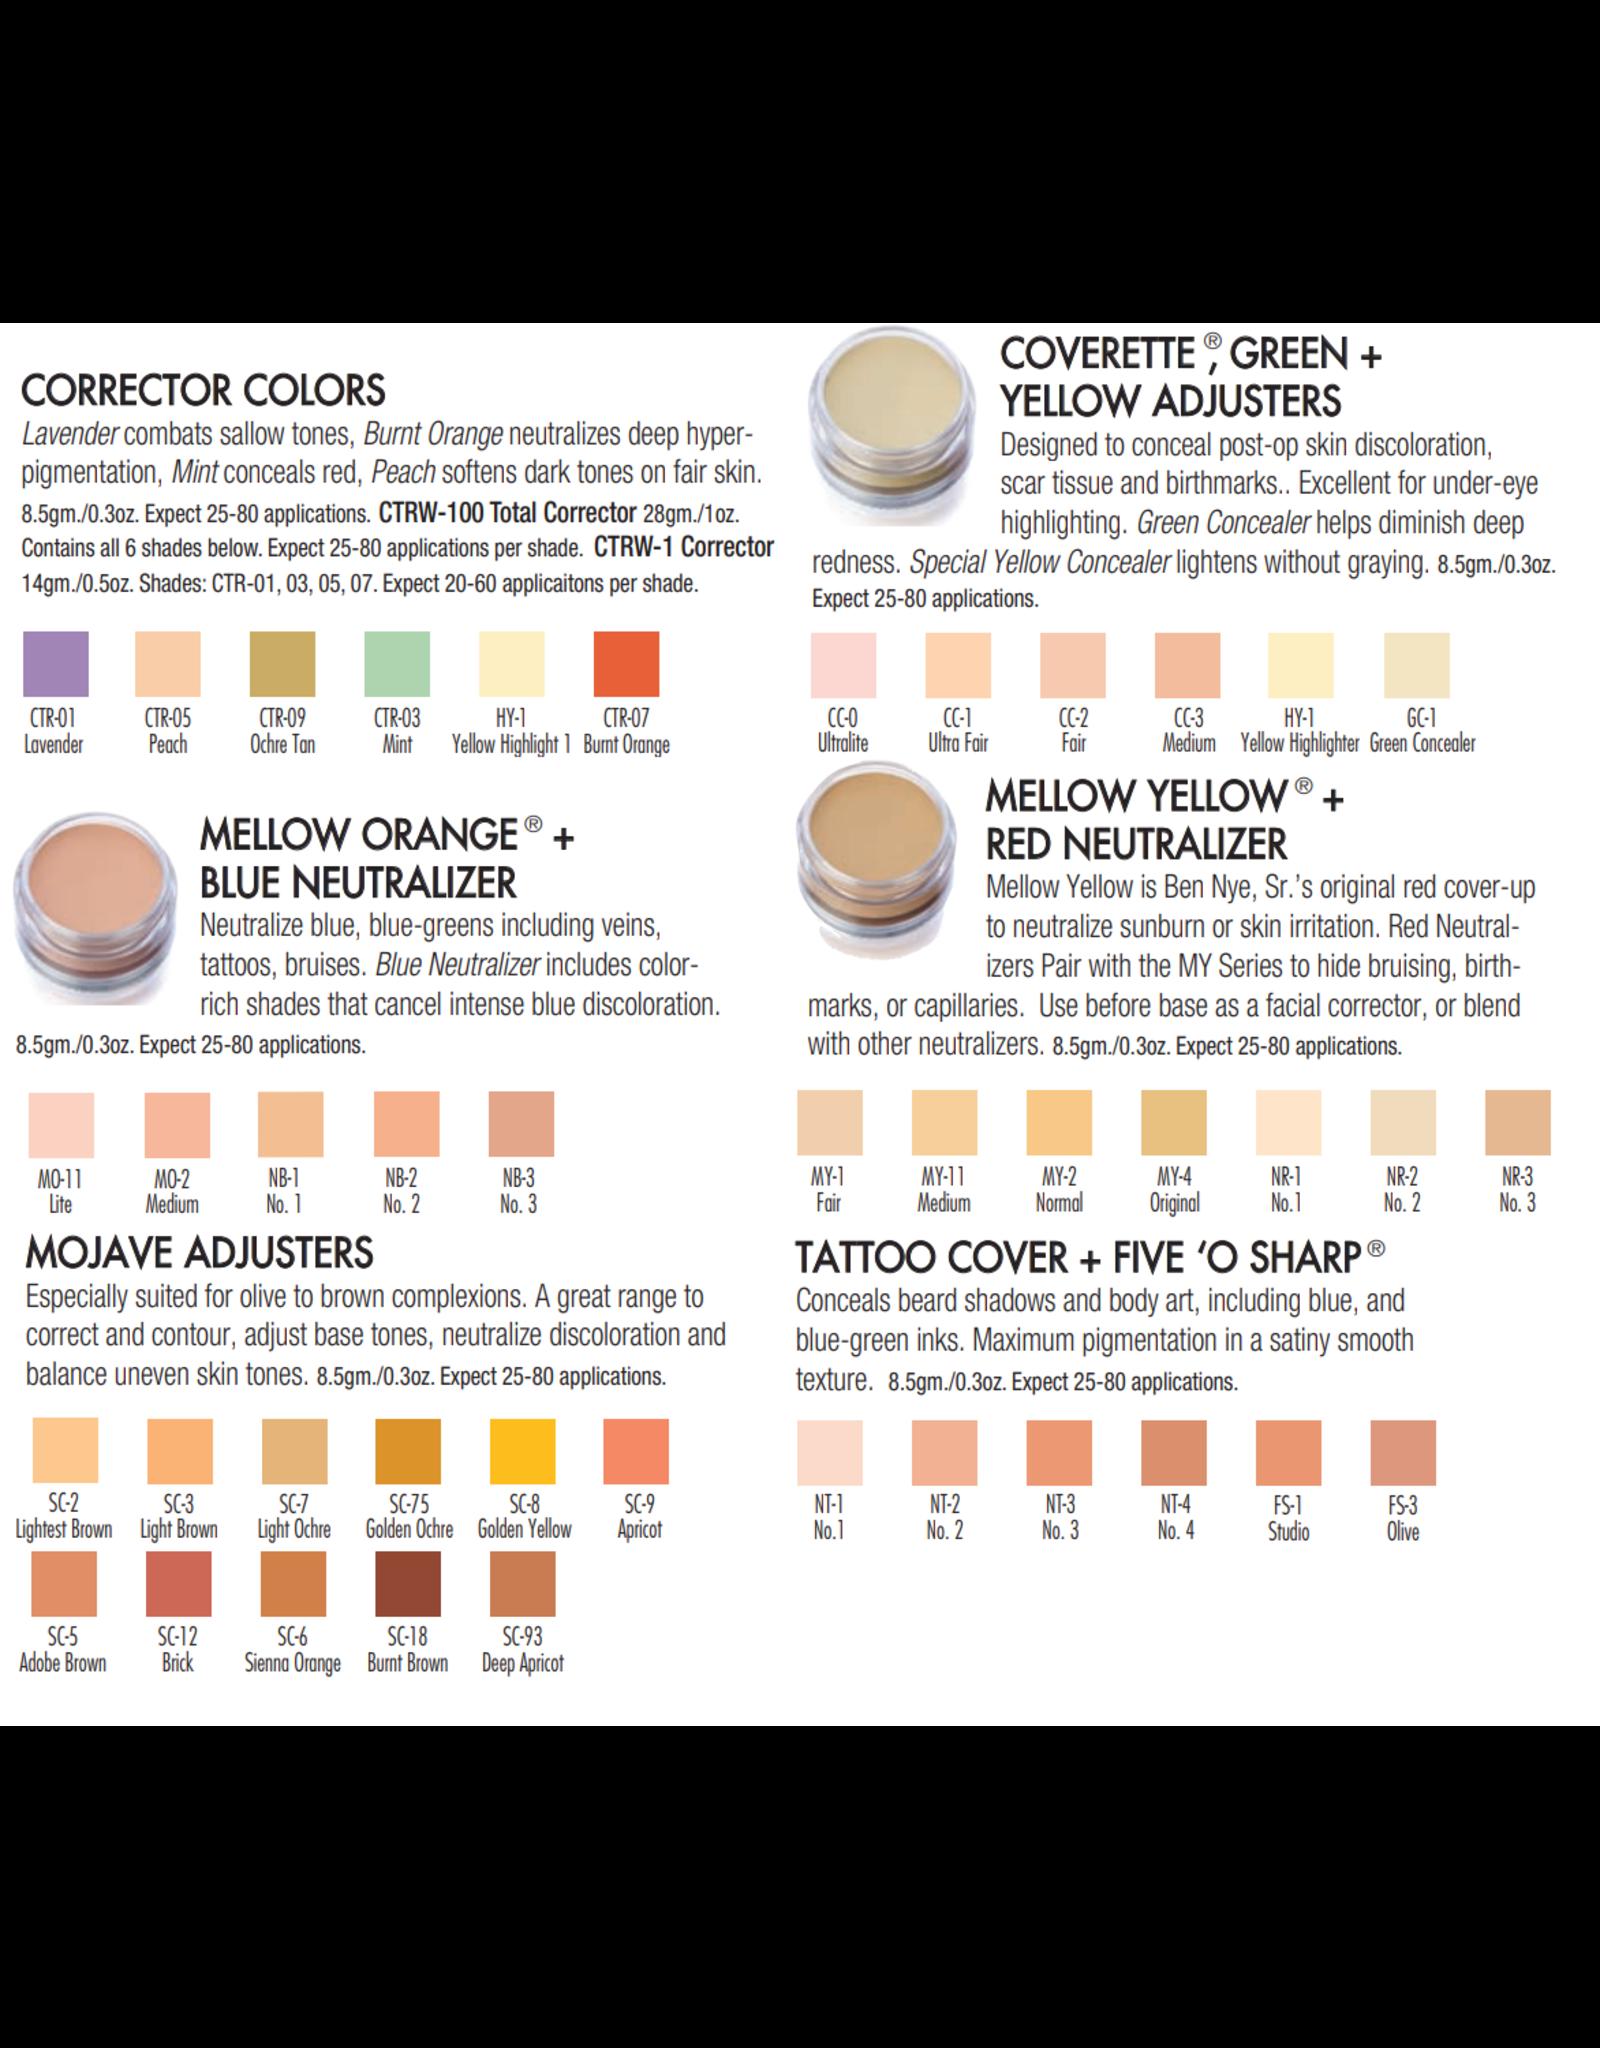 Ben Nye Ben Nye Tattoo Cover Concealers & Adjusters